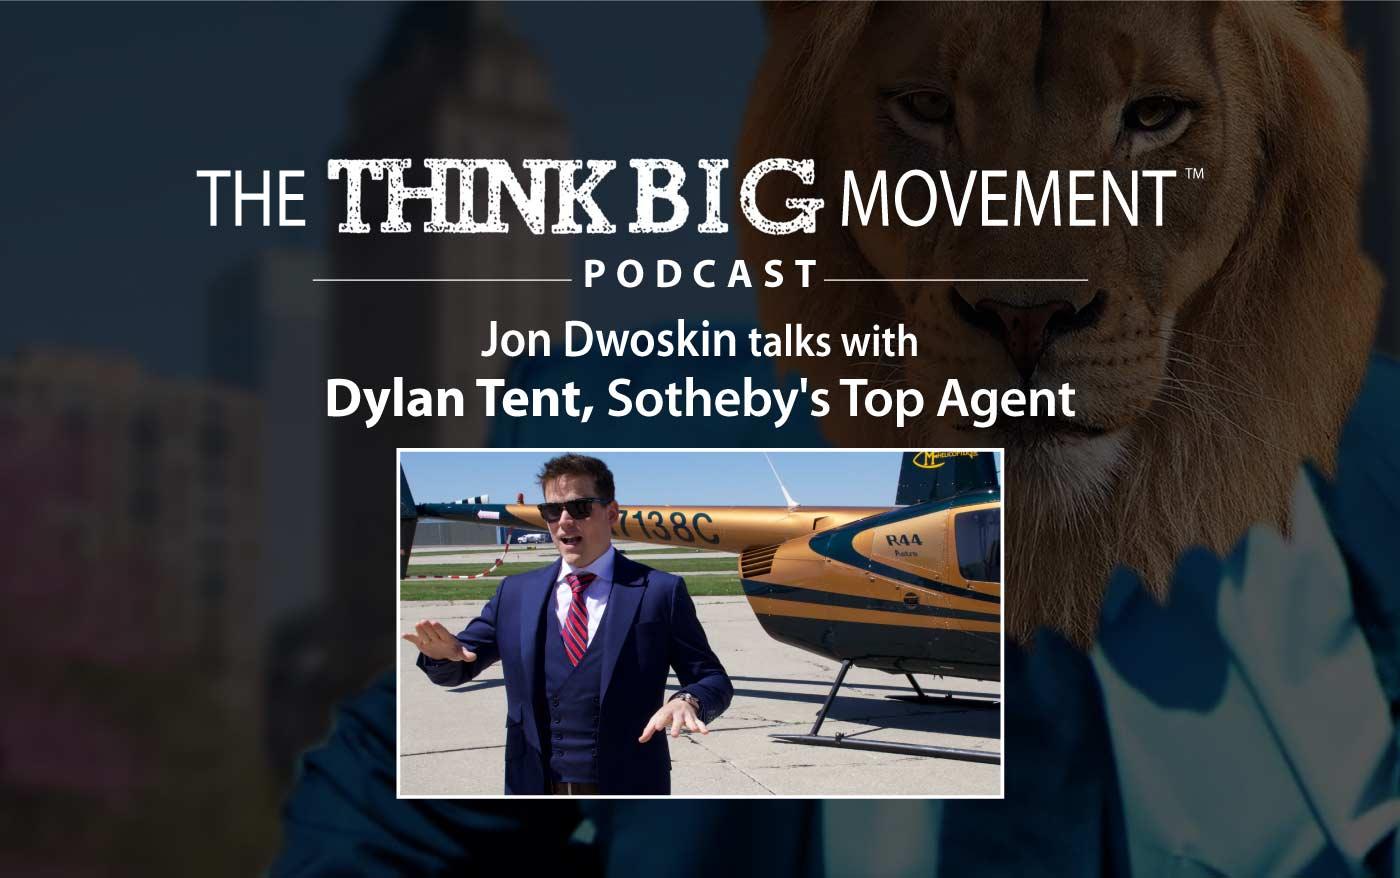 Think Big Movement Podcast - Jon Dwoskin Interviews Dylan Tent